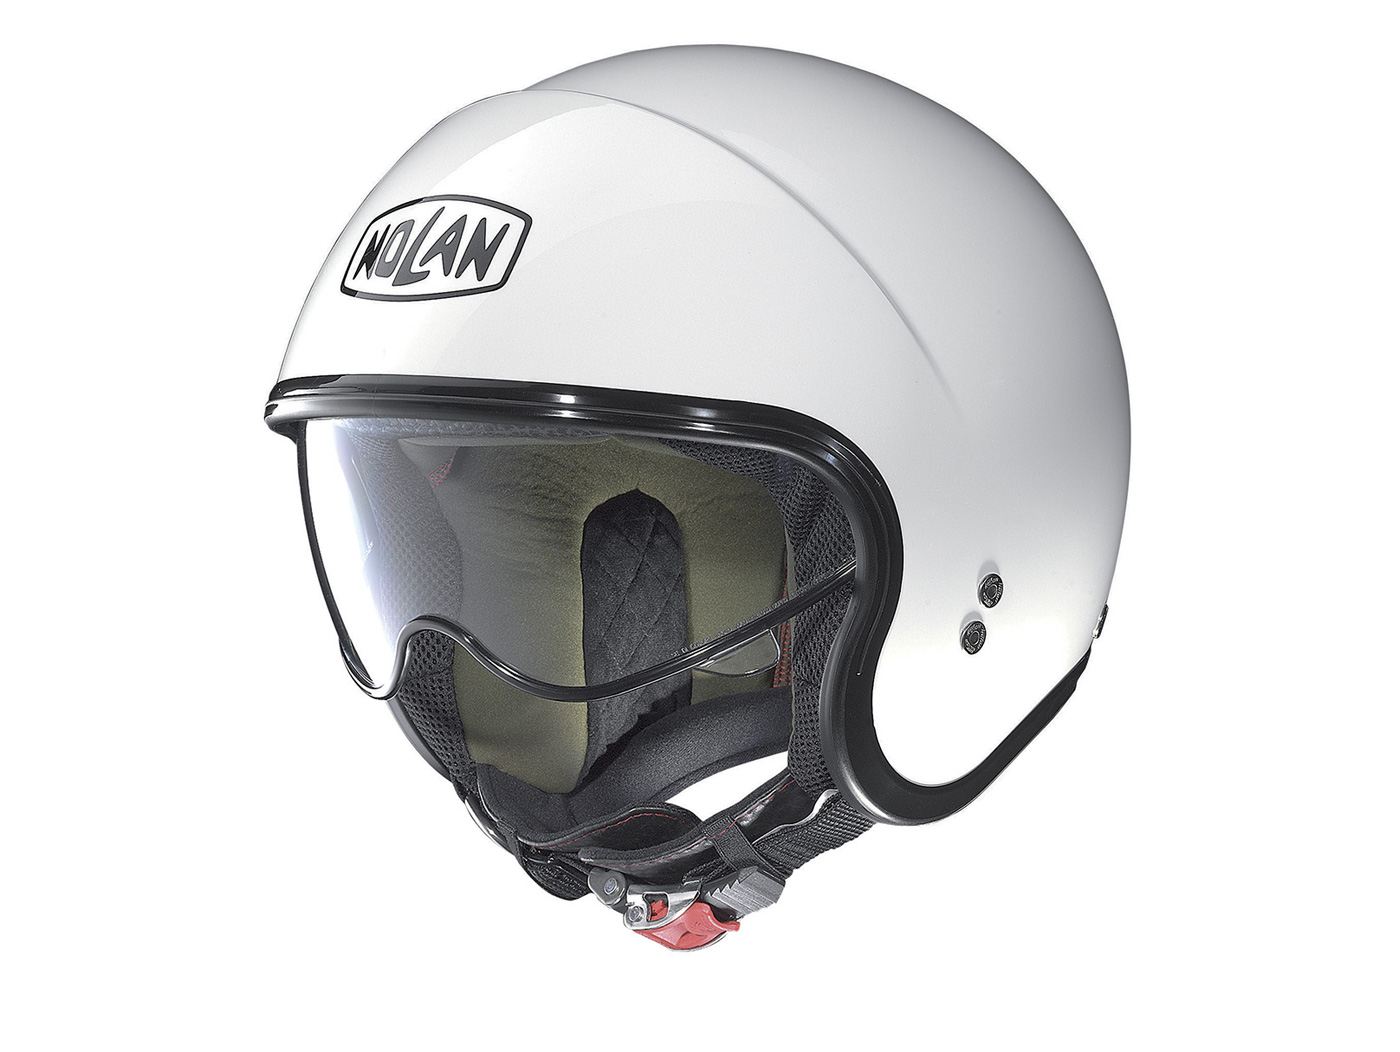 86e7e95e Helmet -NOLAN, N21 Classic- open face helmet, metallic white -   Helmets    Riders gear   Scooter Center